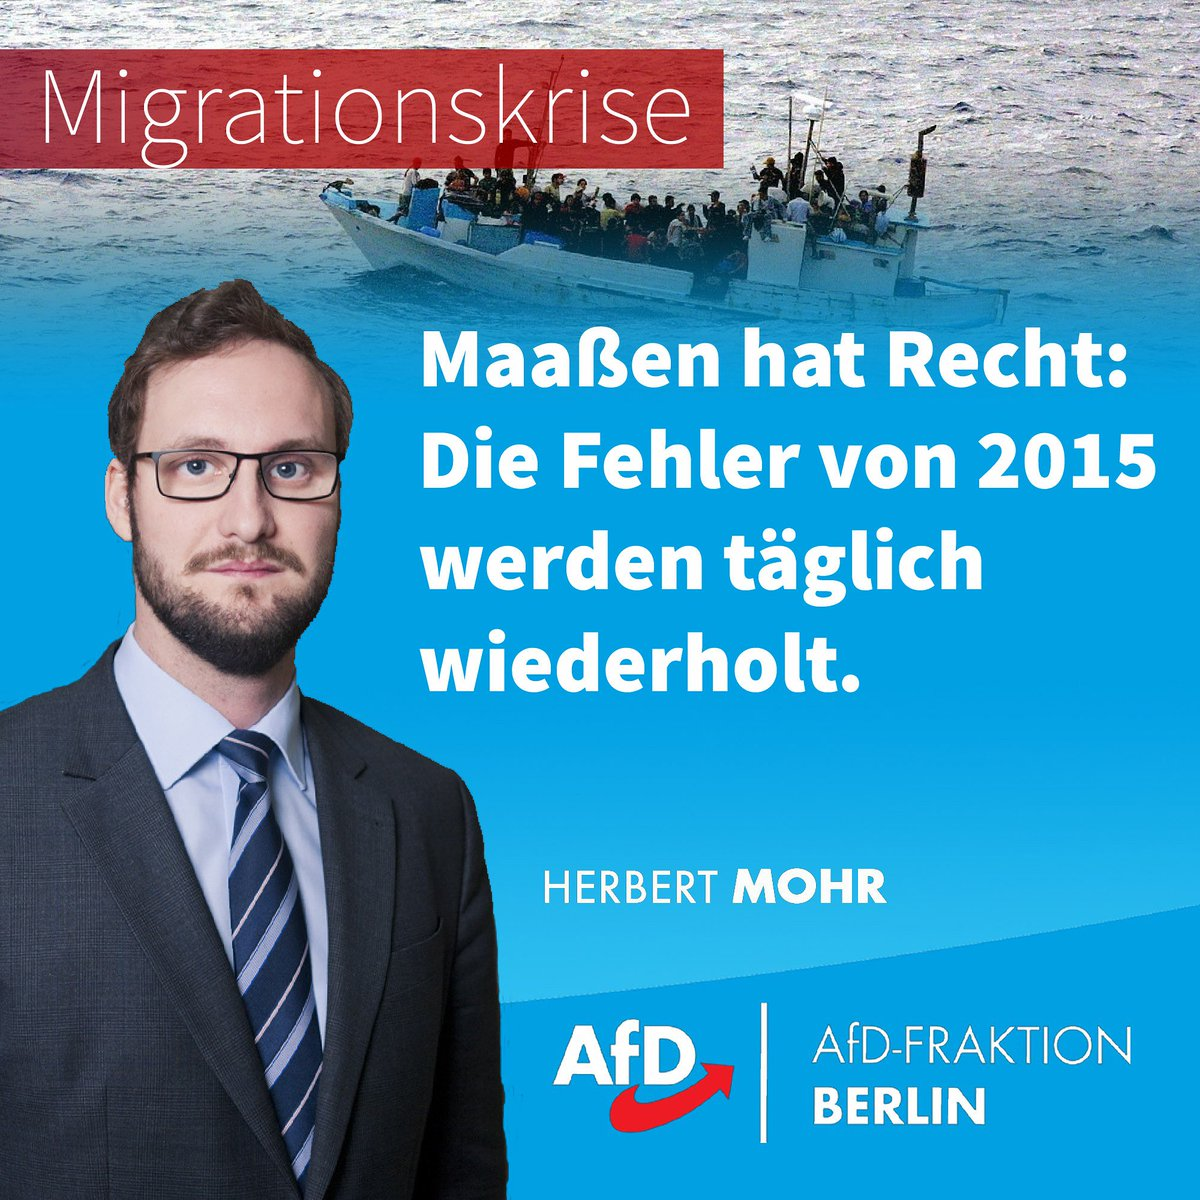 Herbert Mohr MdA's photo on #Maaßen